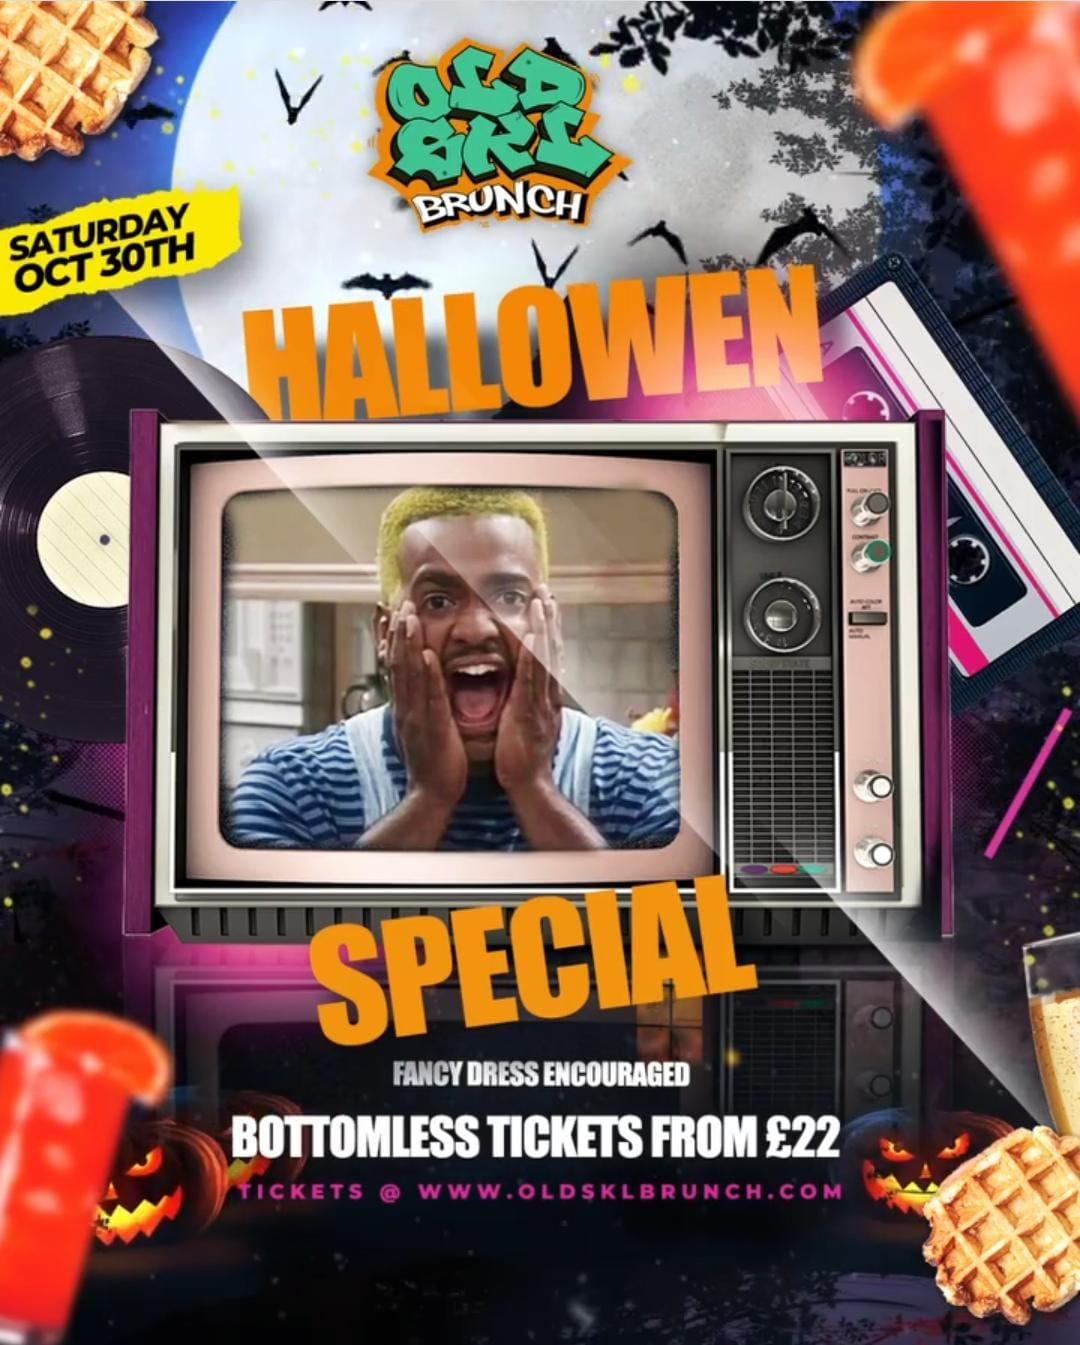 Old Skl Brunch Halloween Special w/ Bottomless Rum Punch